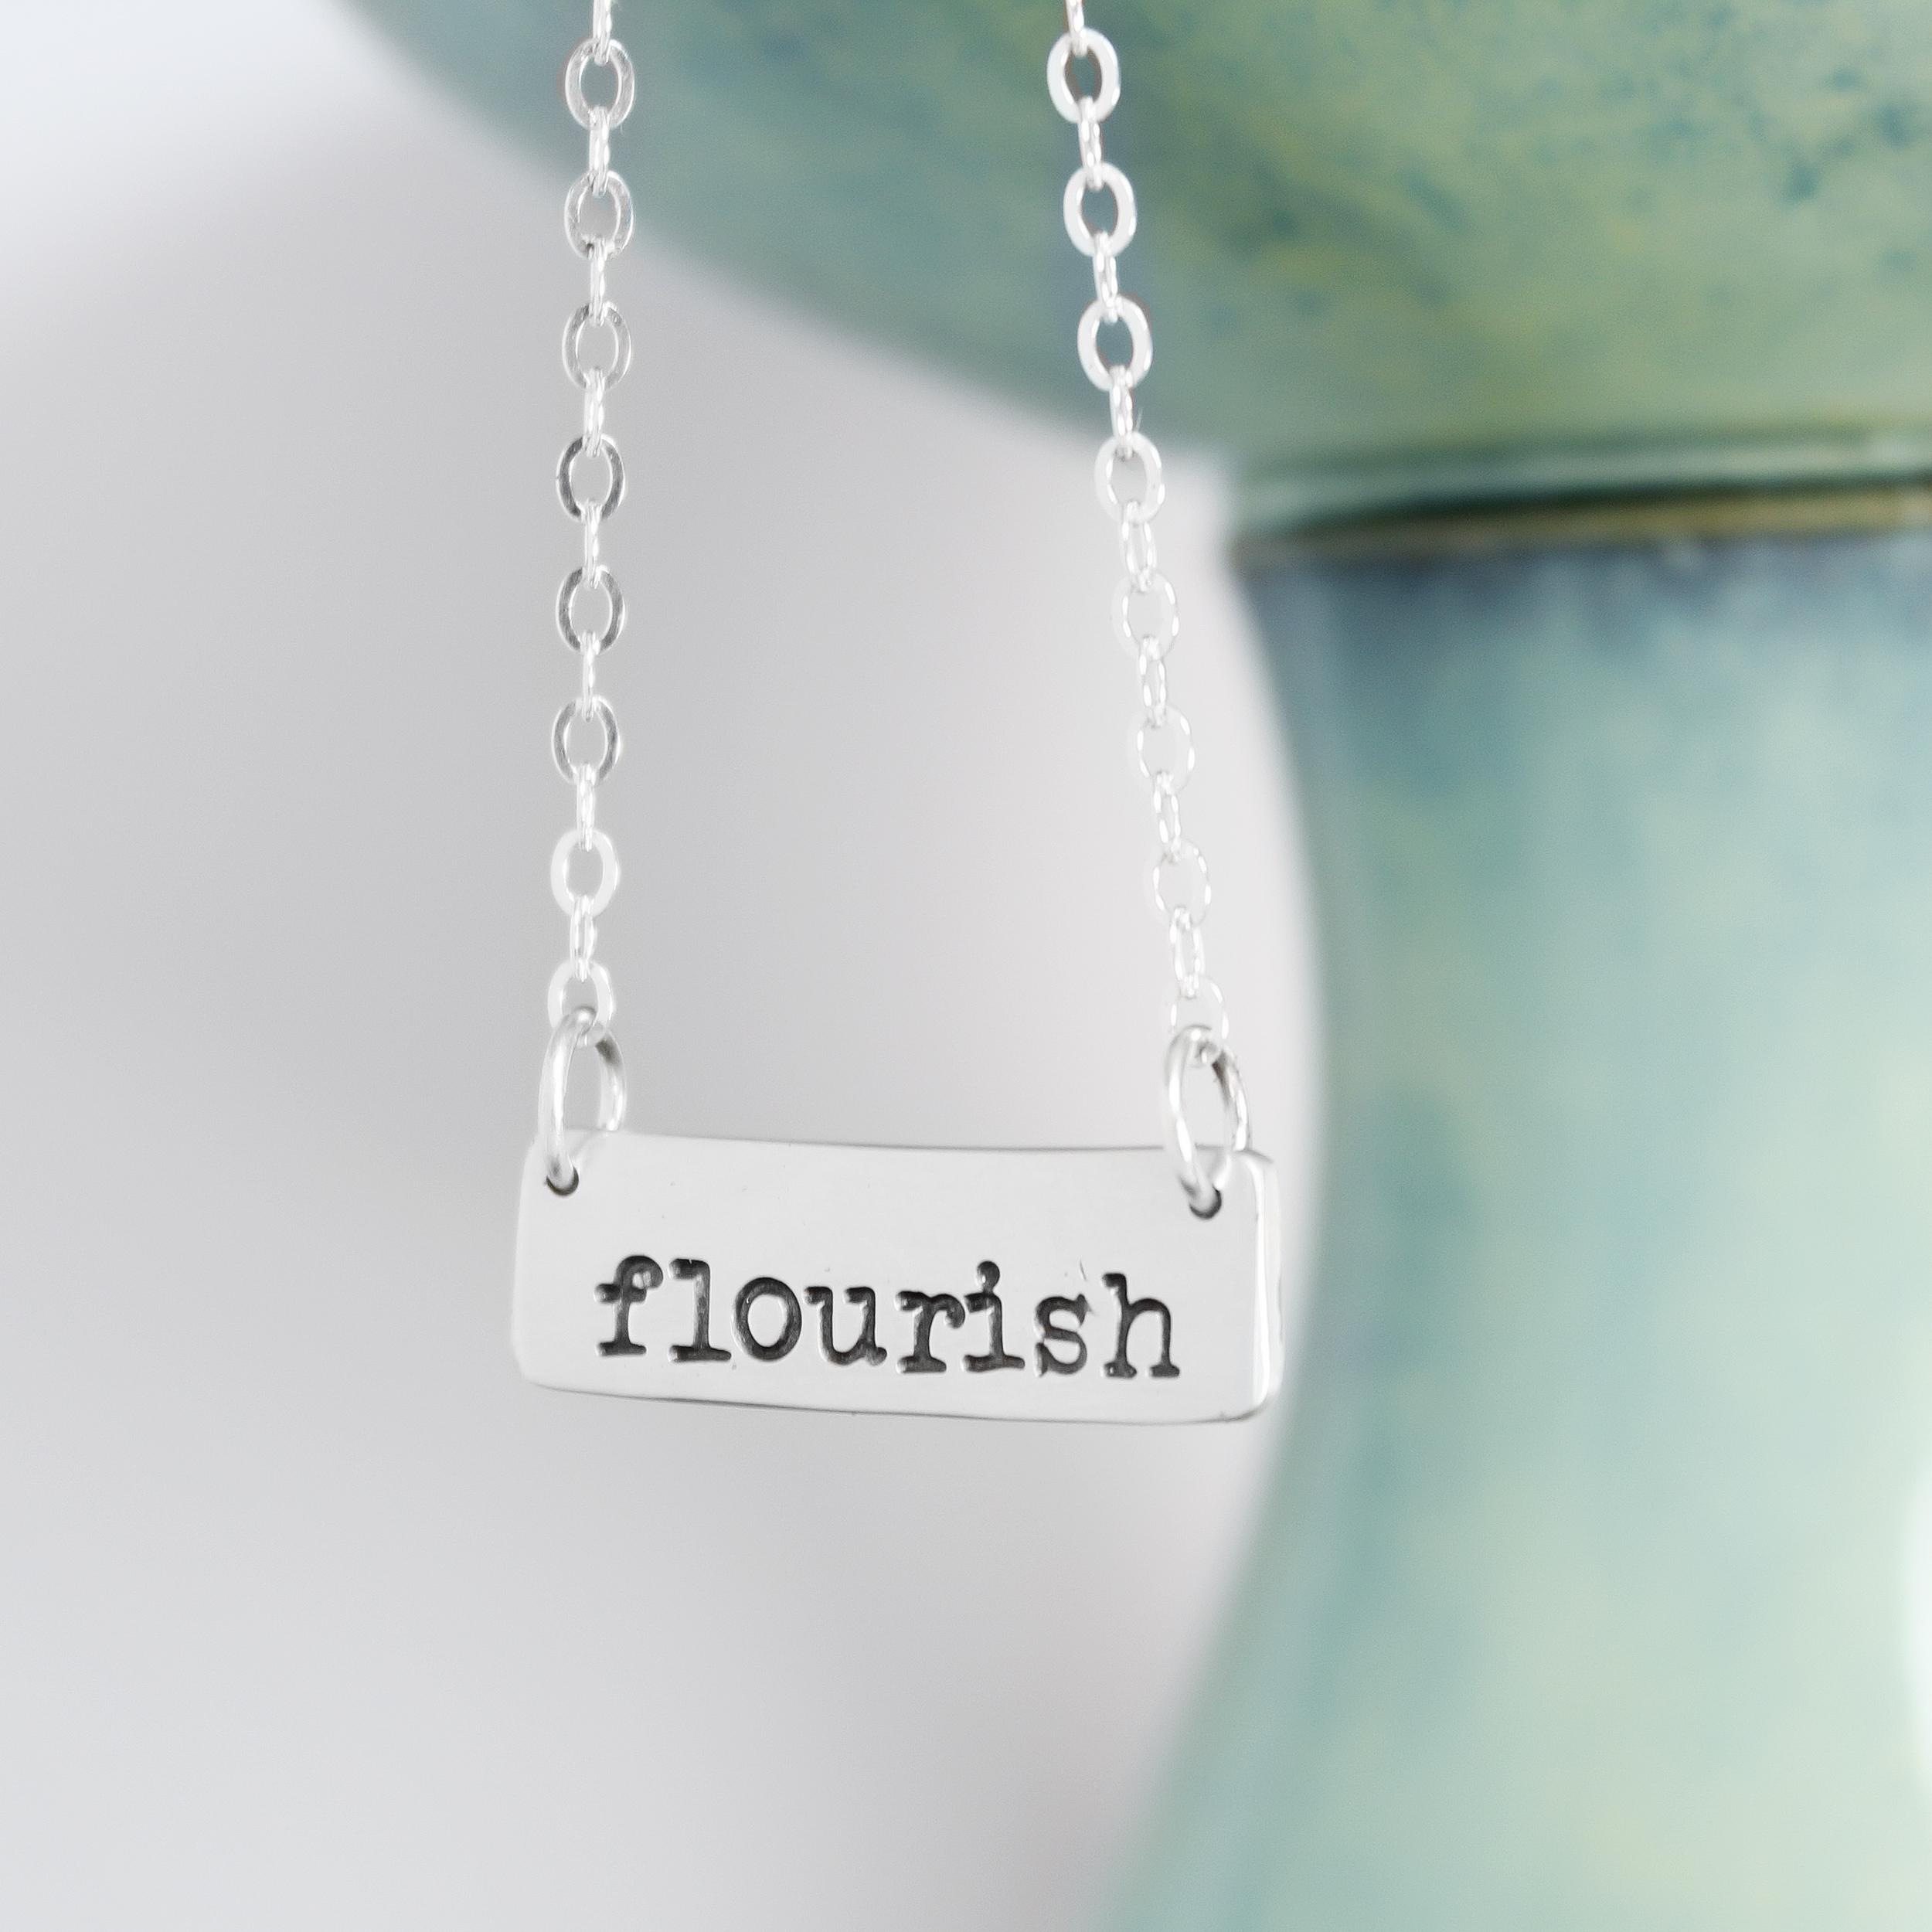 Silver Inspiration Necklace - Flourish Necklace